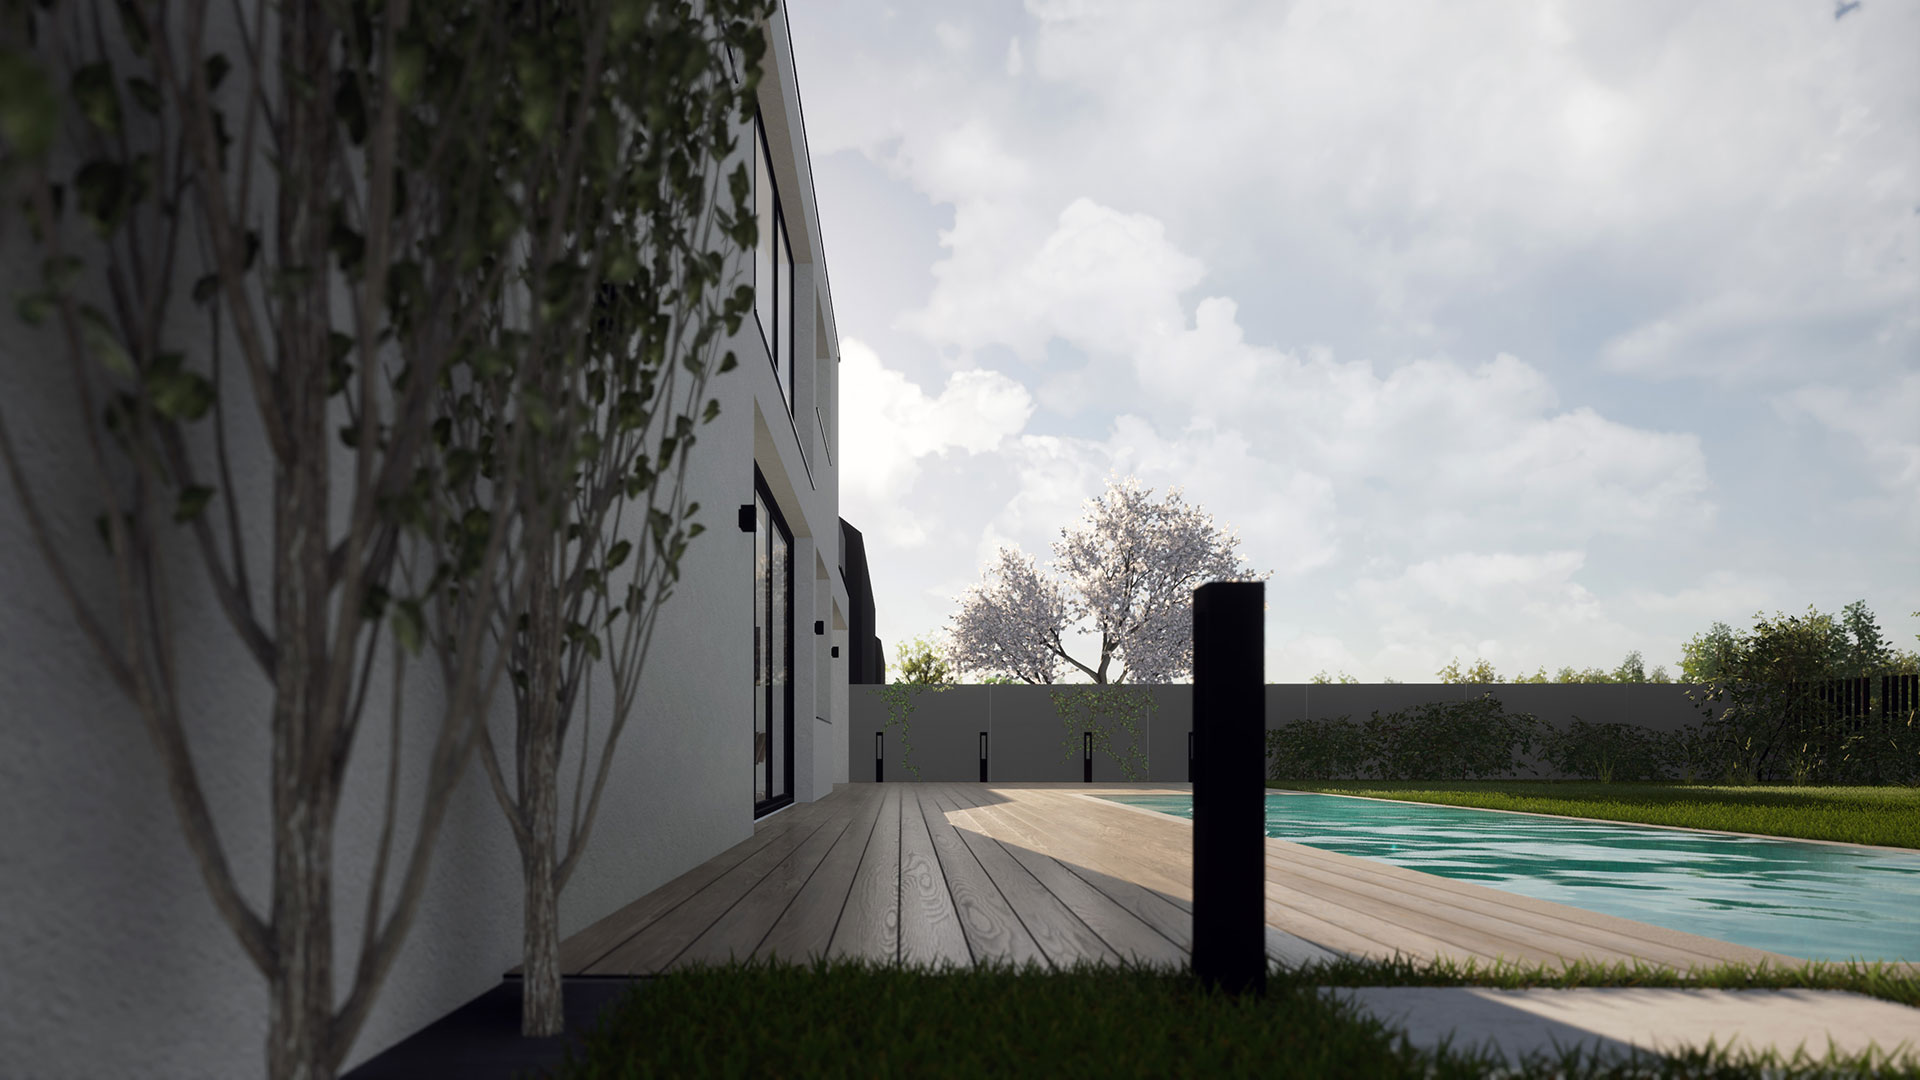 Stanovanjska hiša SSM - pogled